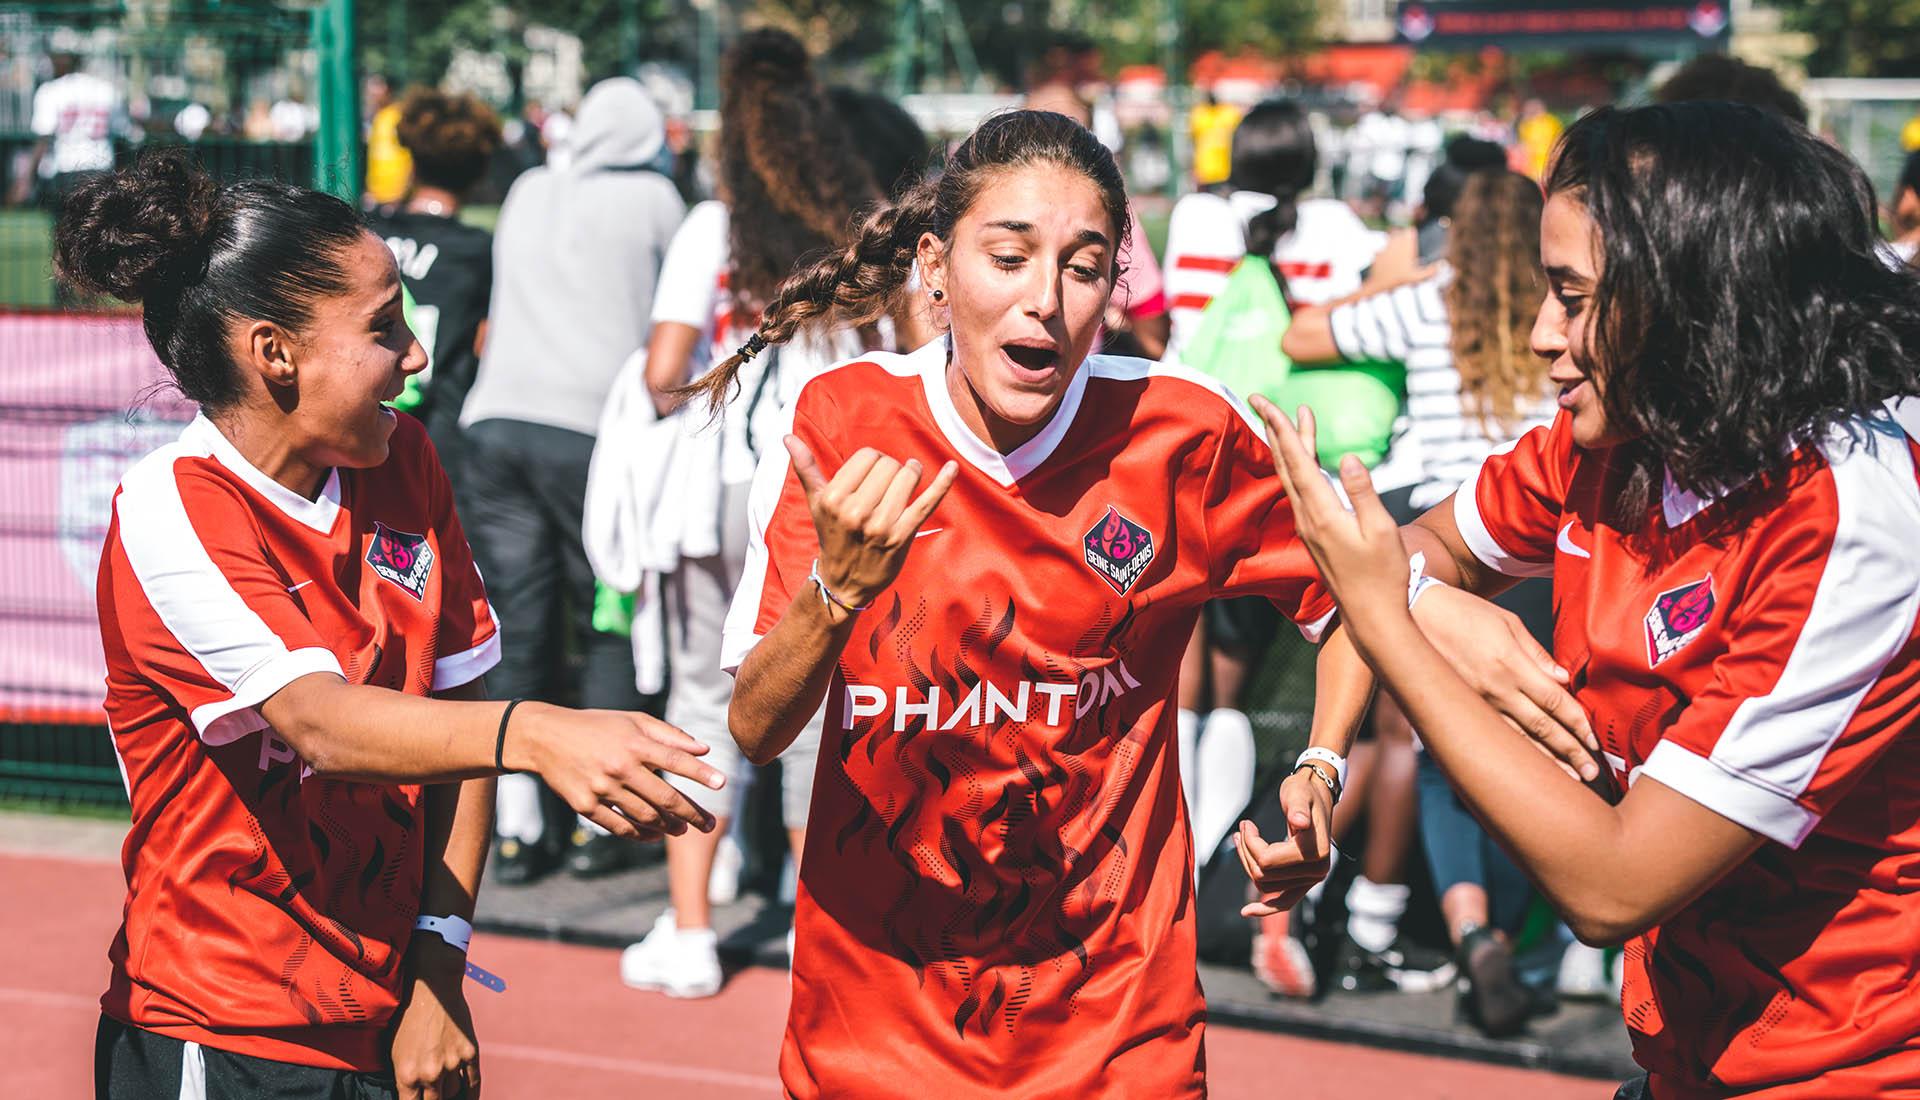 top quality 100% genuine low price sale Nike Host Tournoi Phantom Du Grand Paris Finale - SoccerBible